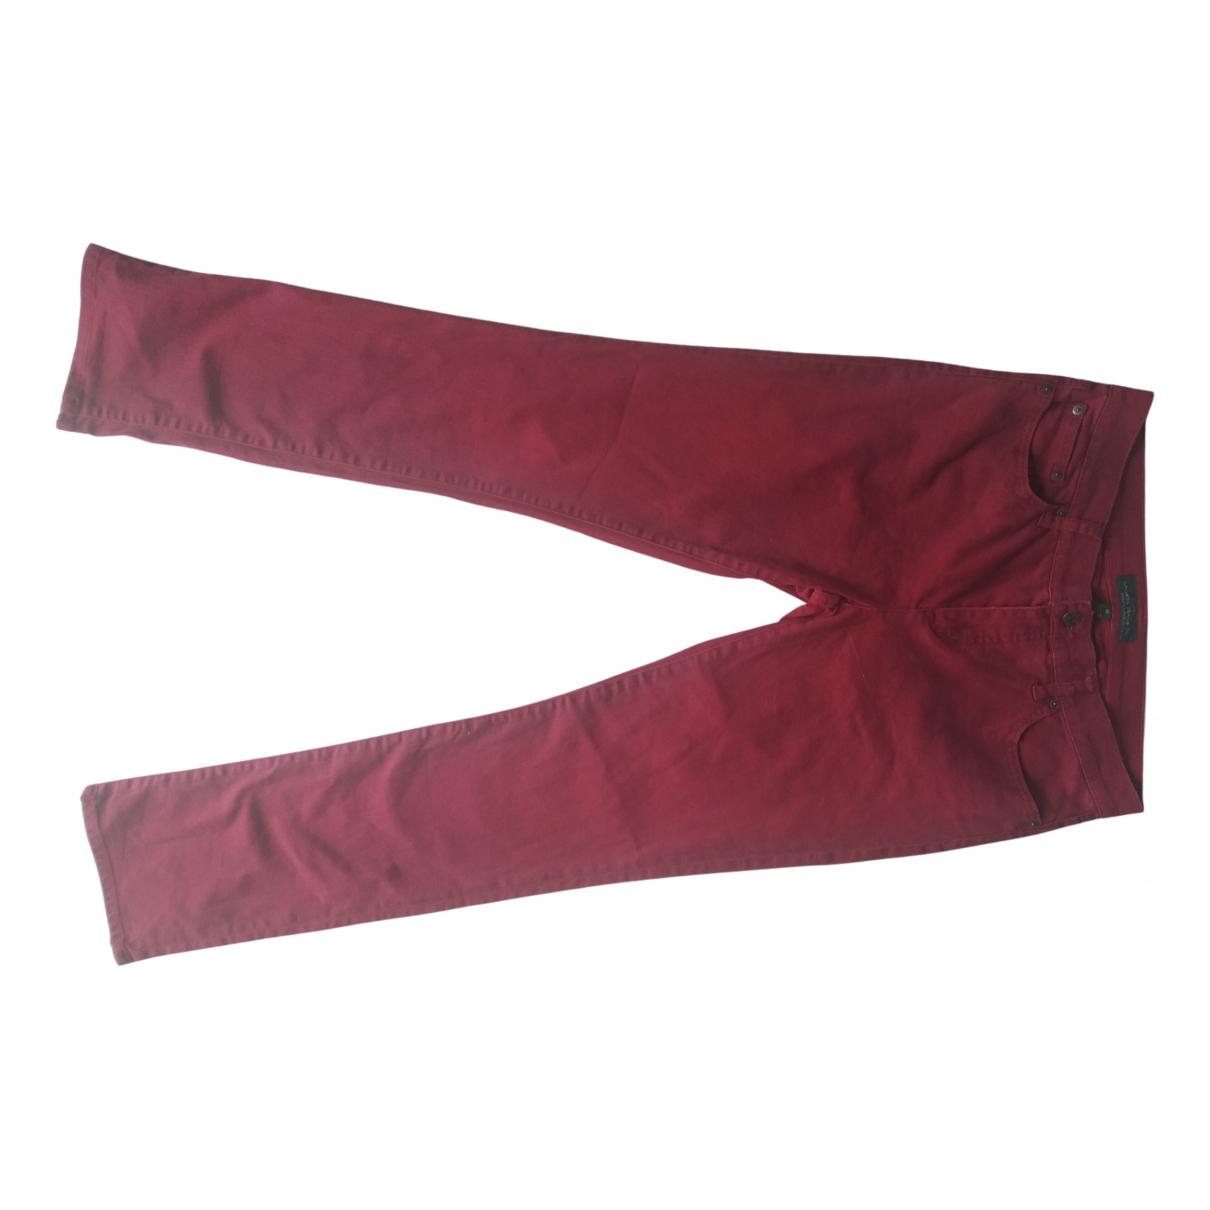 Lauren Ralph Lauren \N Burgundy Cotton - elasthane Jeans for Women 42 FR